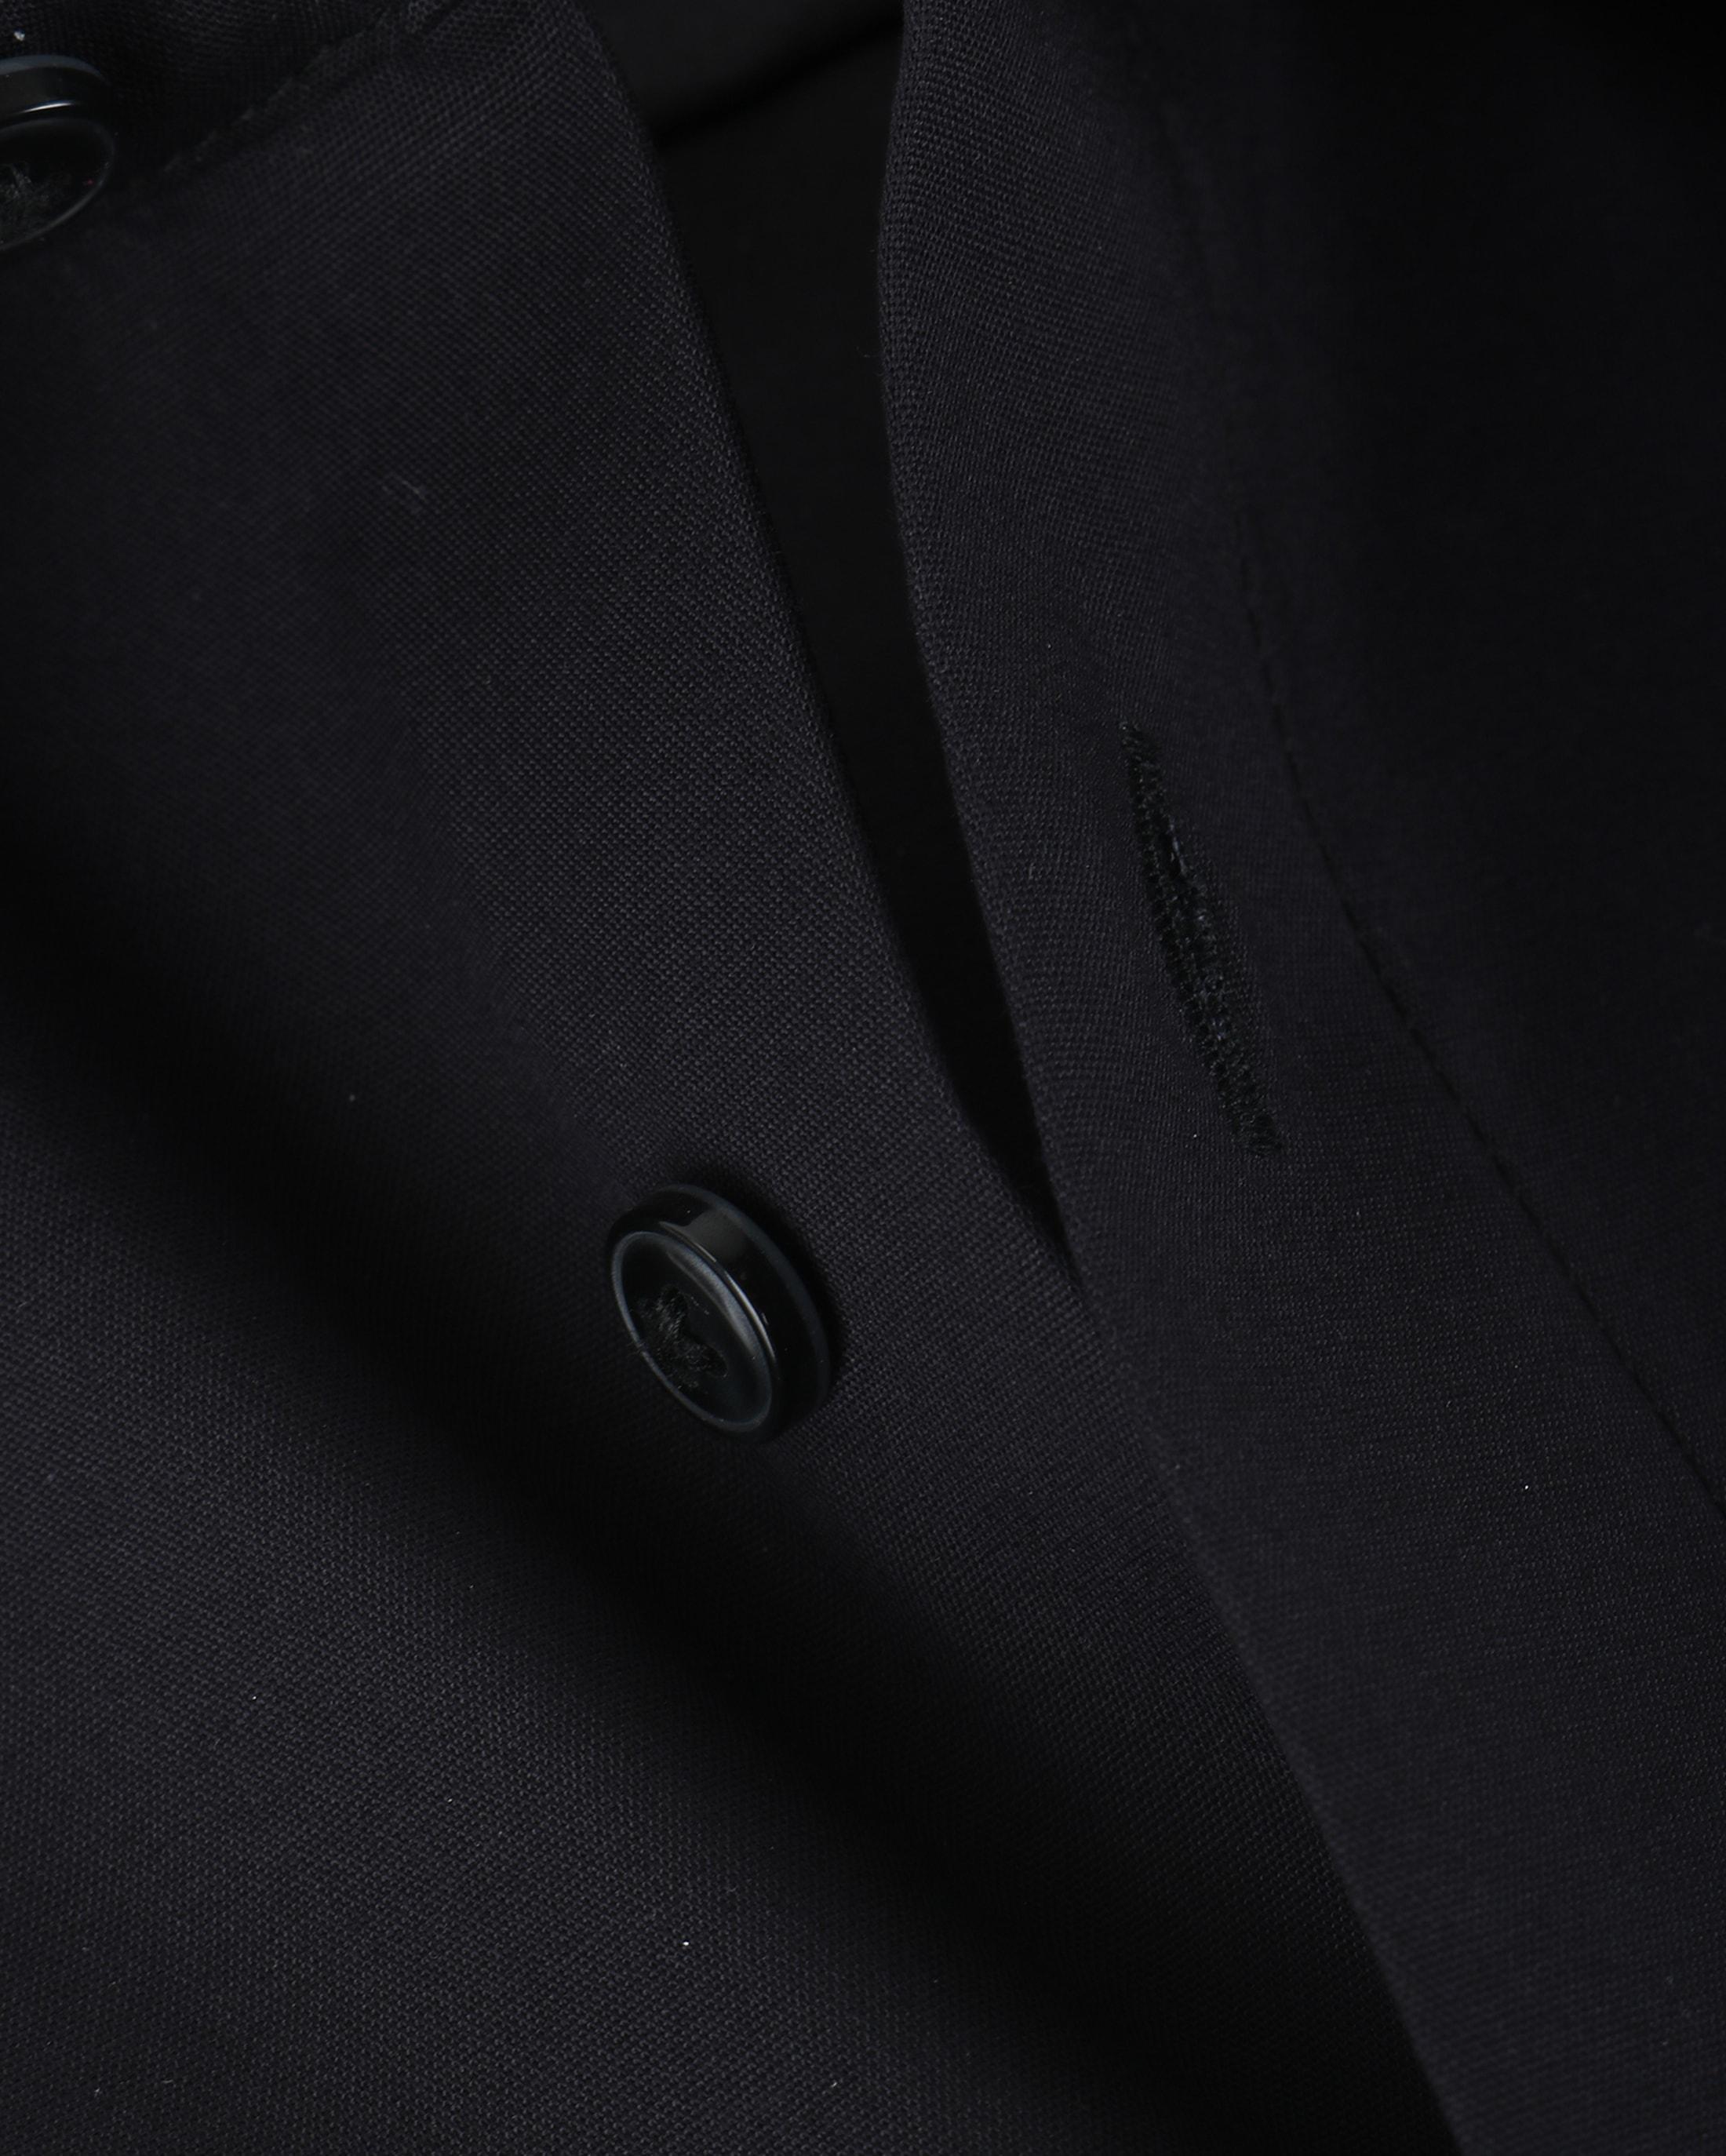 OLYMP Luxor Shirt Zwart Comfort Fit foto 2